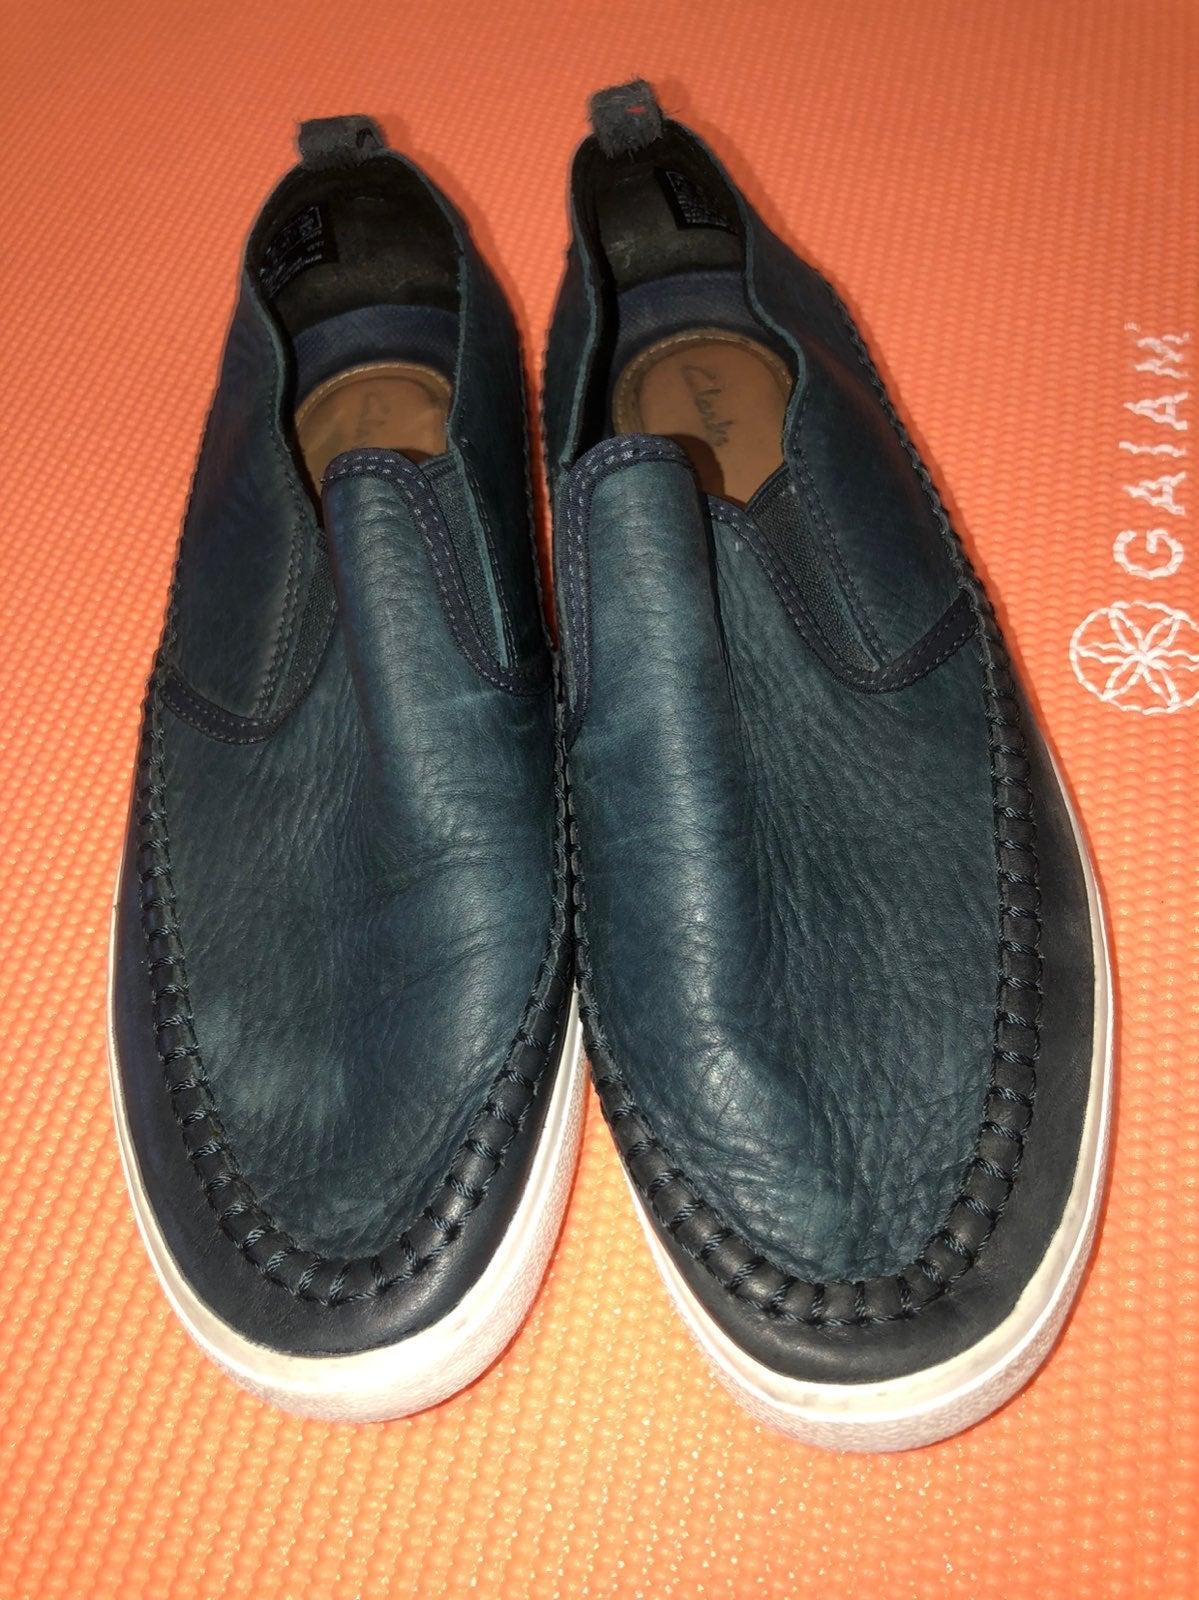 Men CLARKS leather slip on shoes!